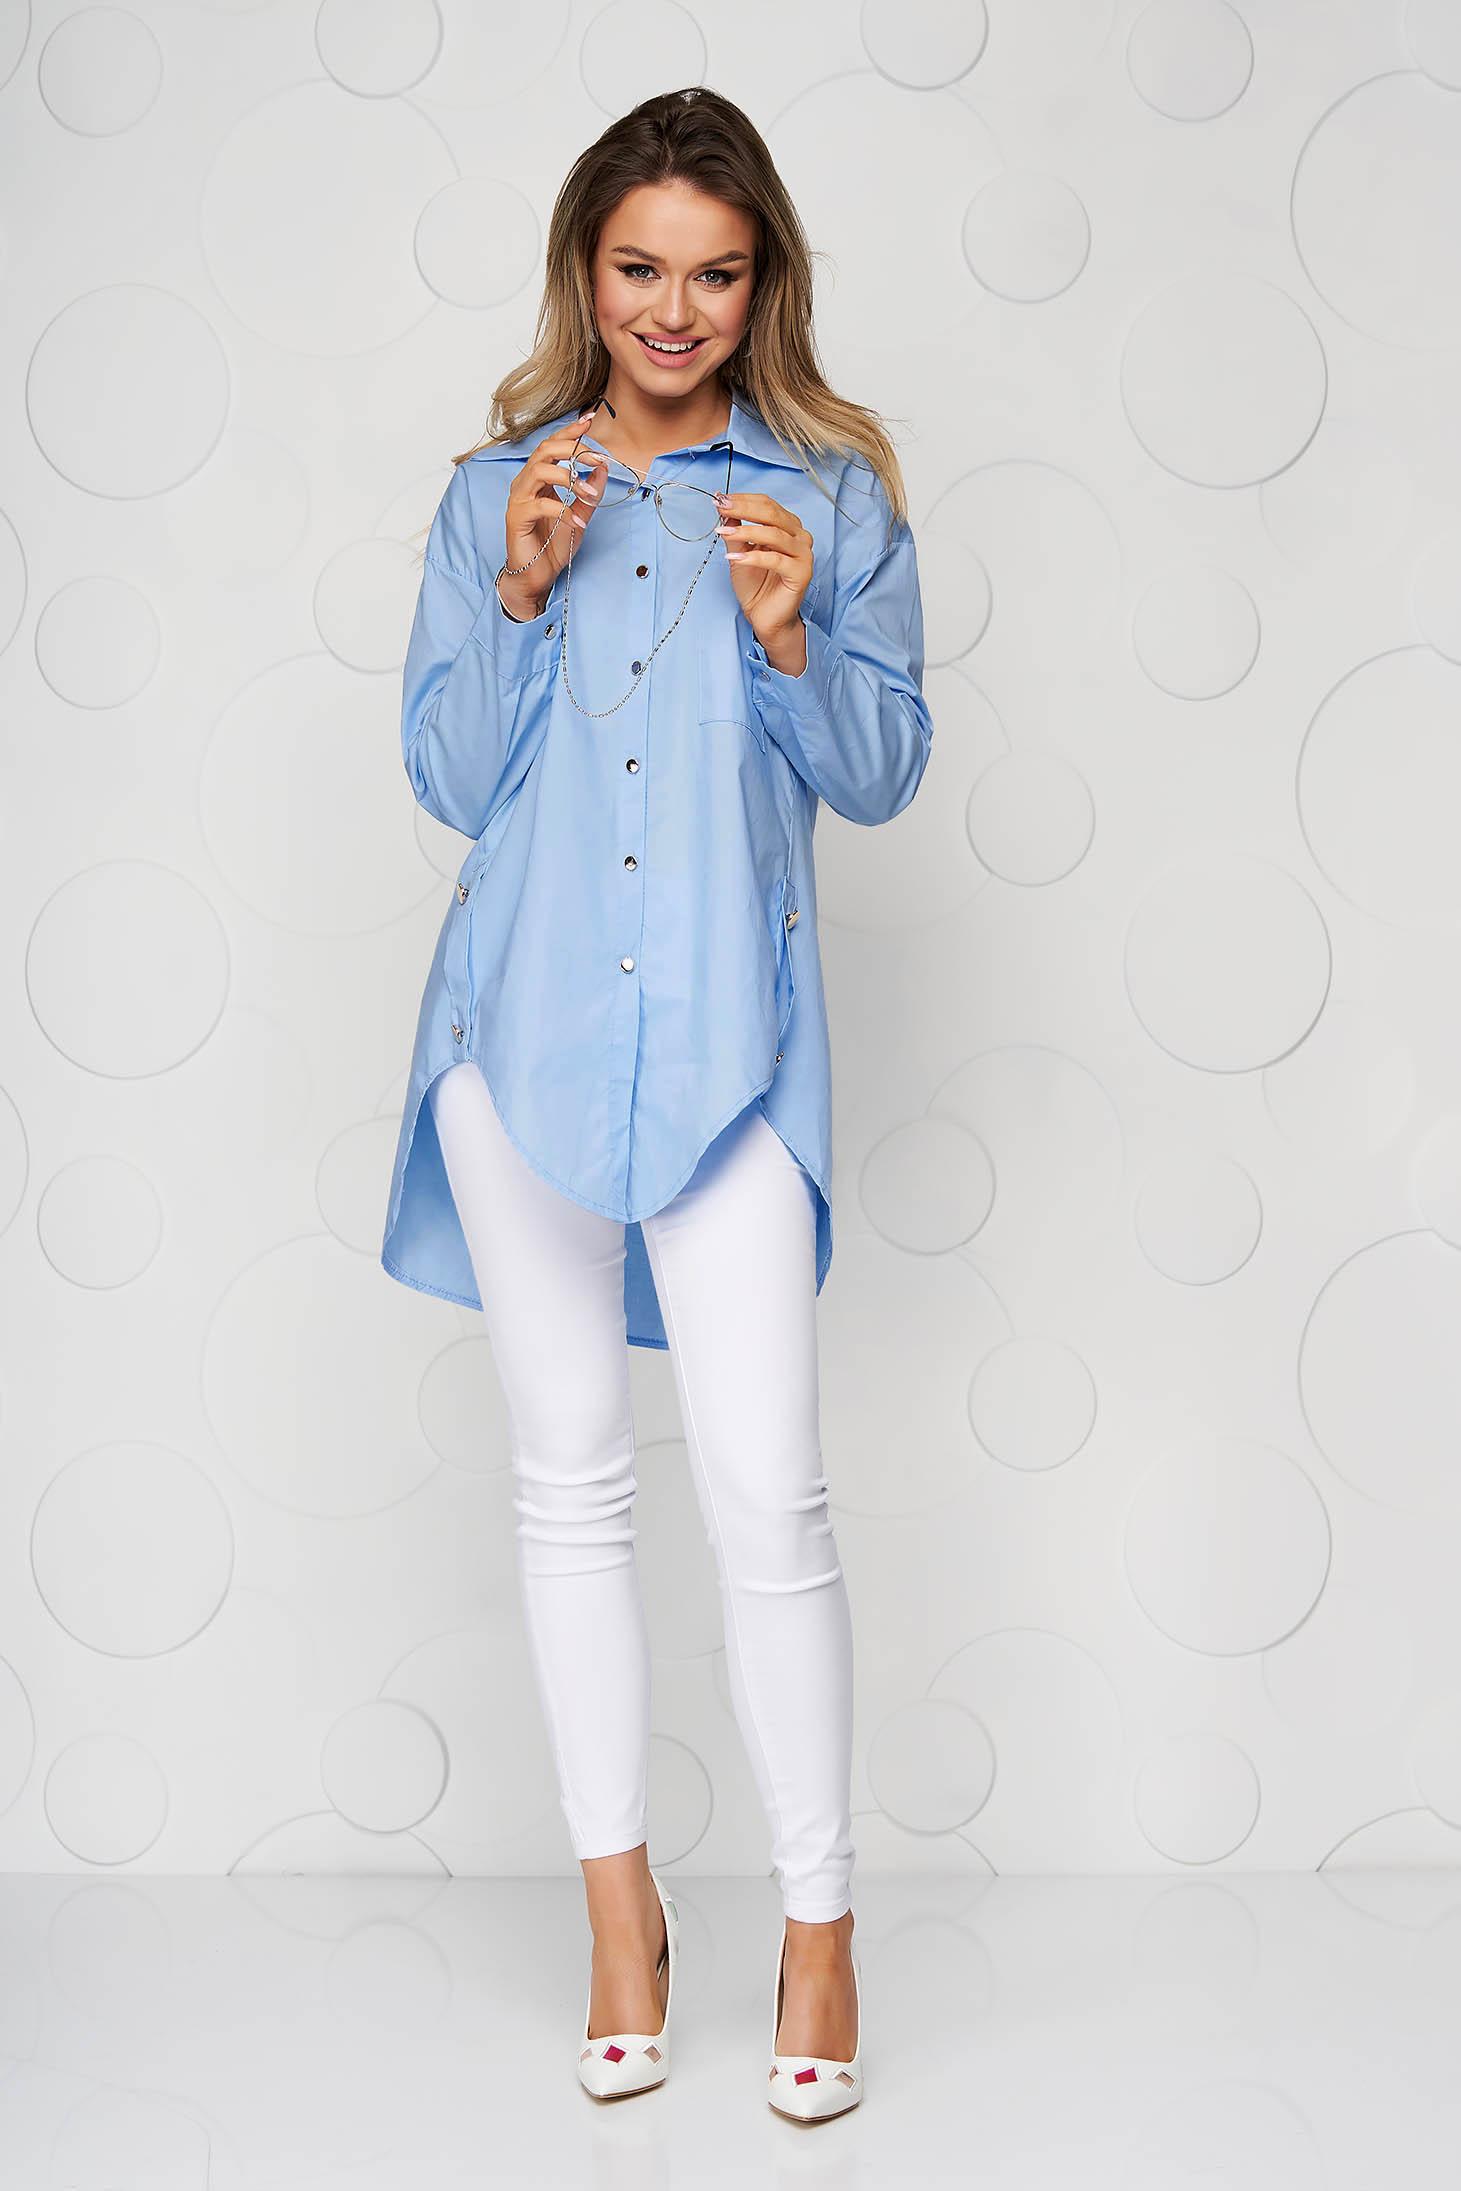 Blue casual poplin, thin cotton women`s shirt asymmetrical loose fit